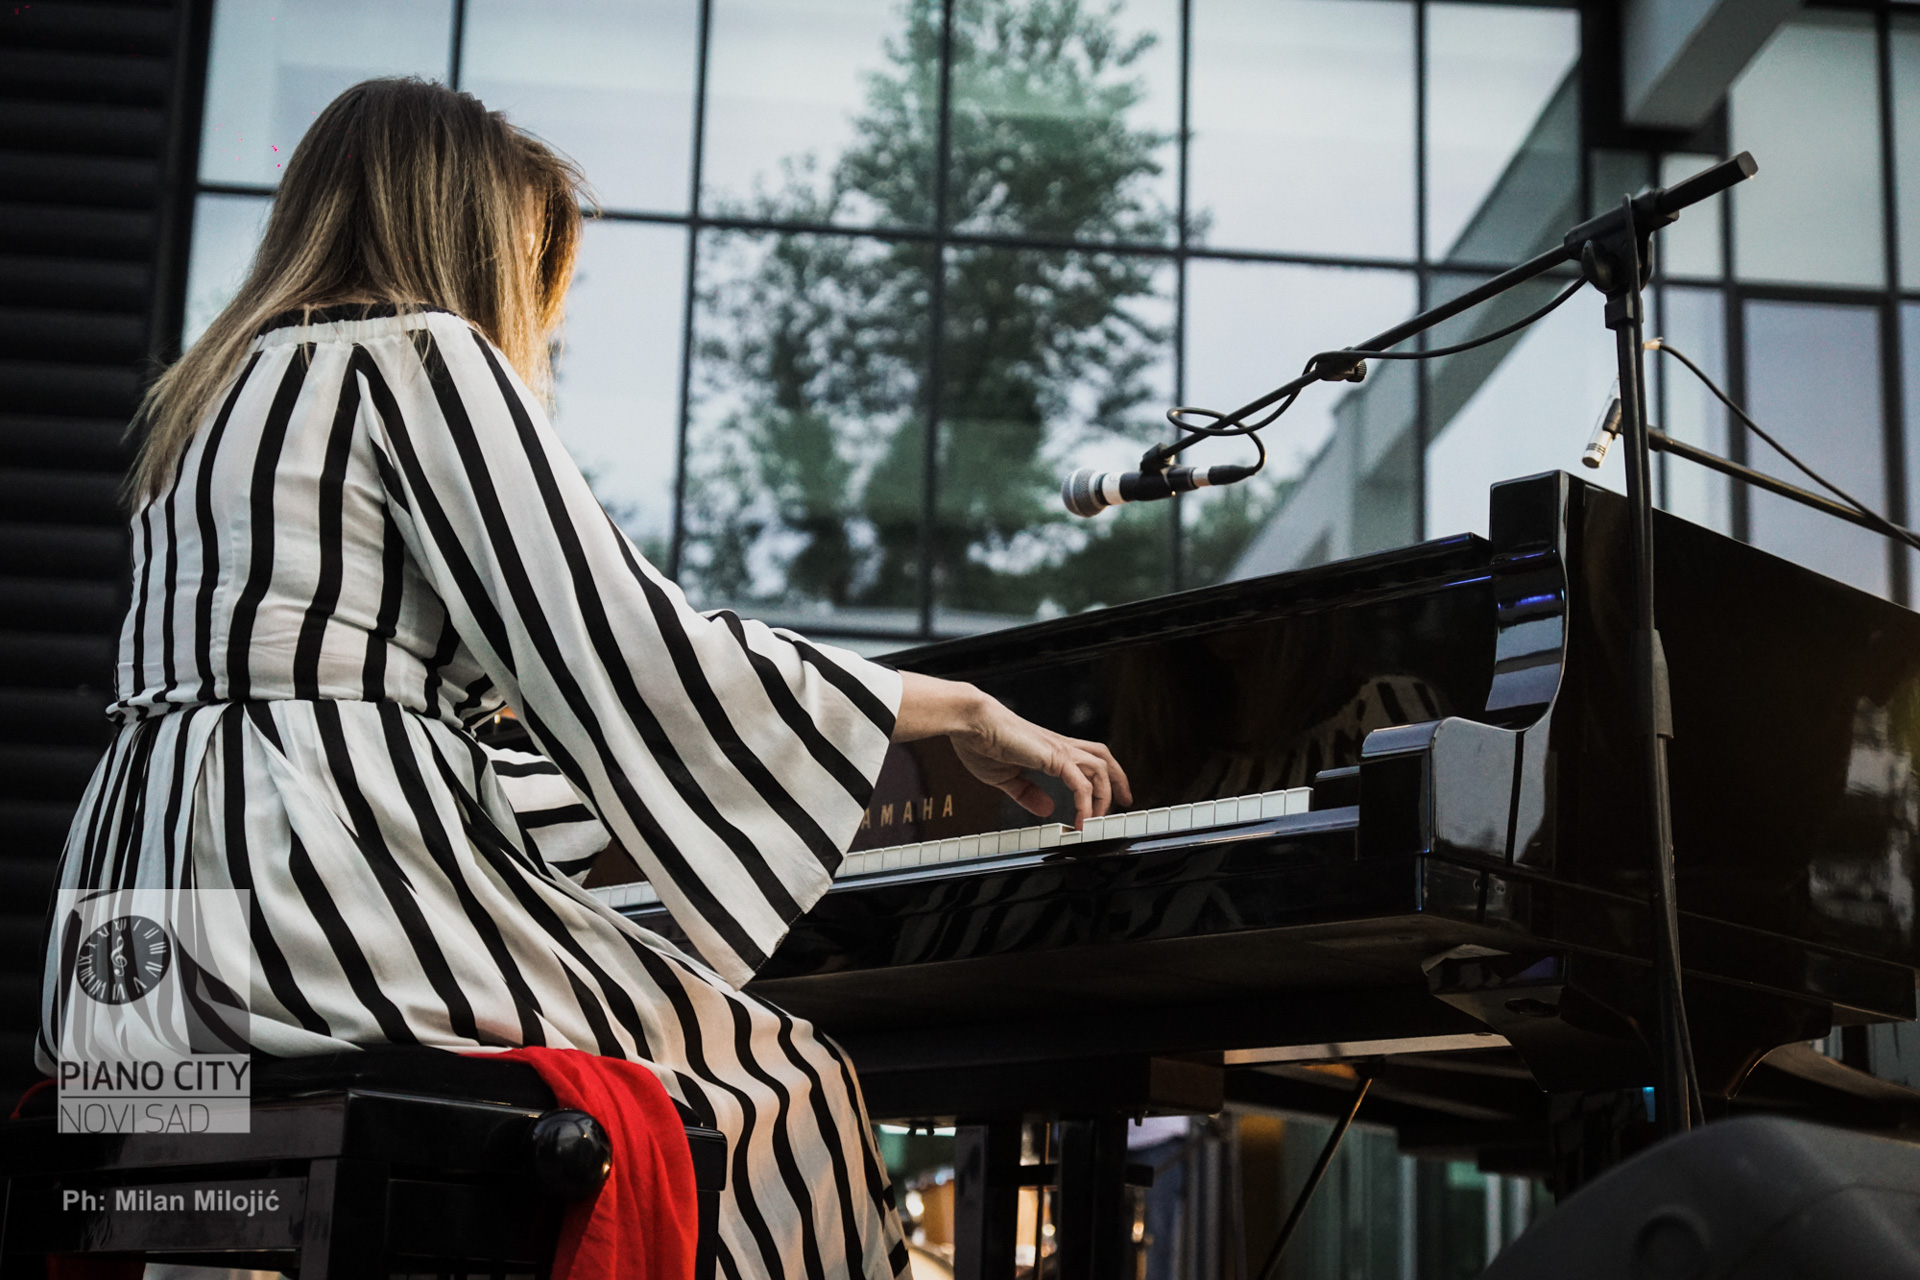 Piano City Novi Sad festival 2019.